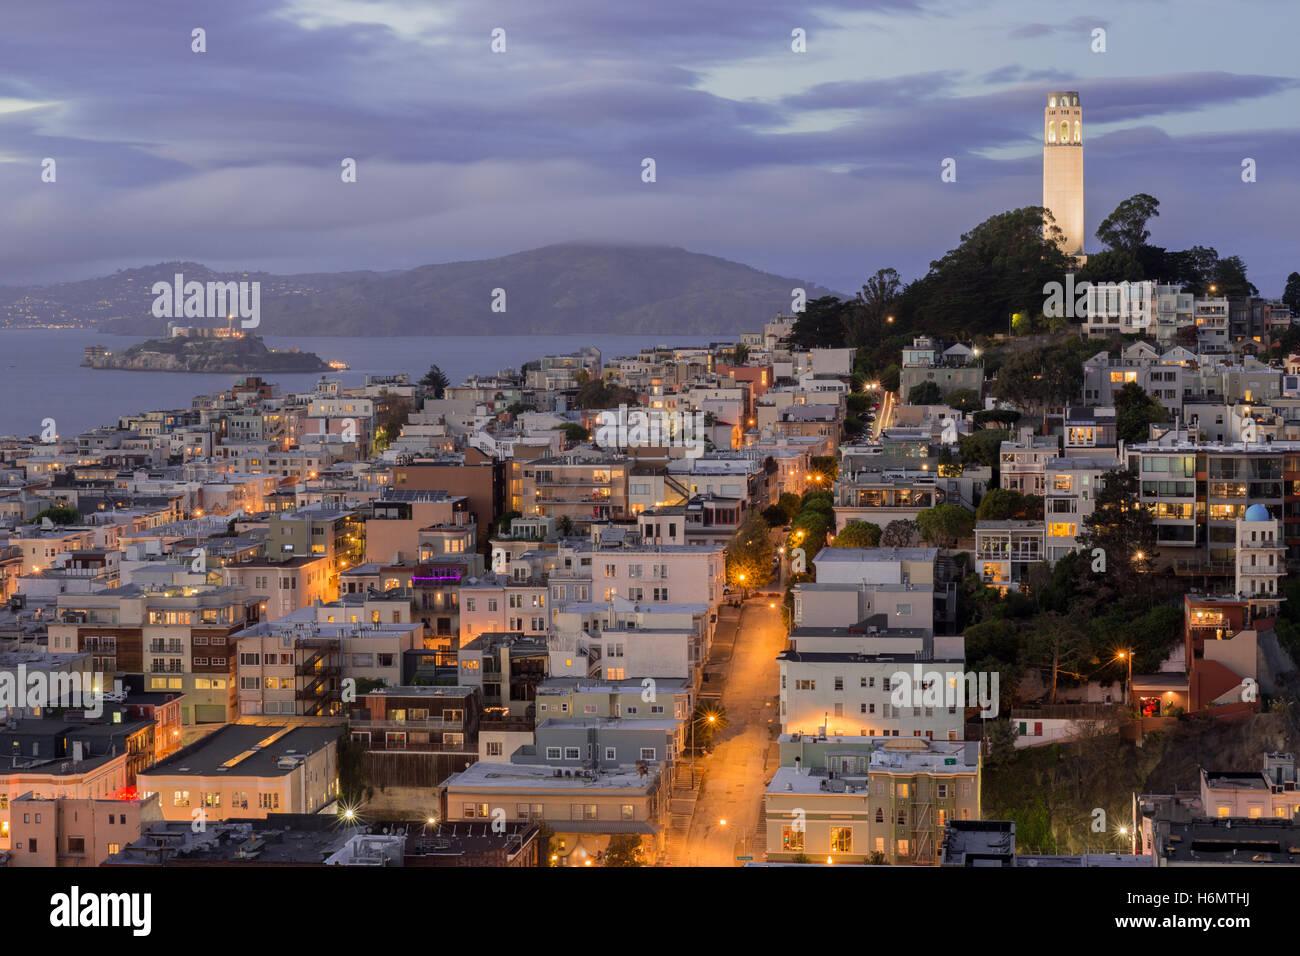 Telegraph Hill and North Beach Neighborhoods - Stock Image